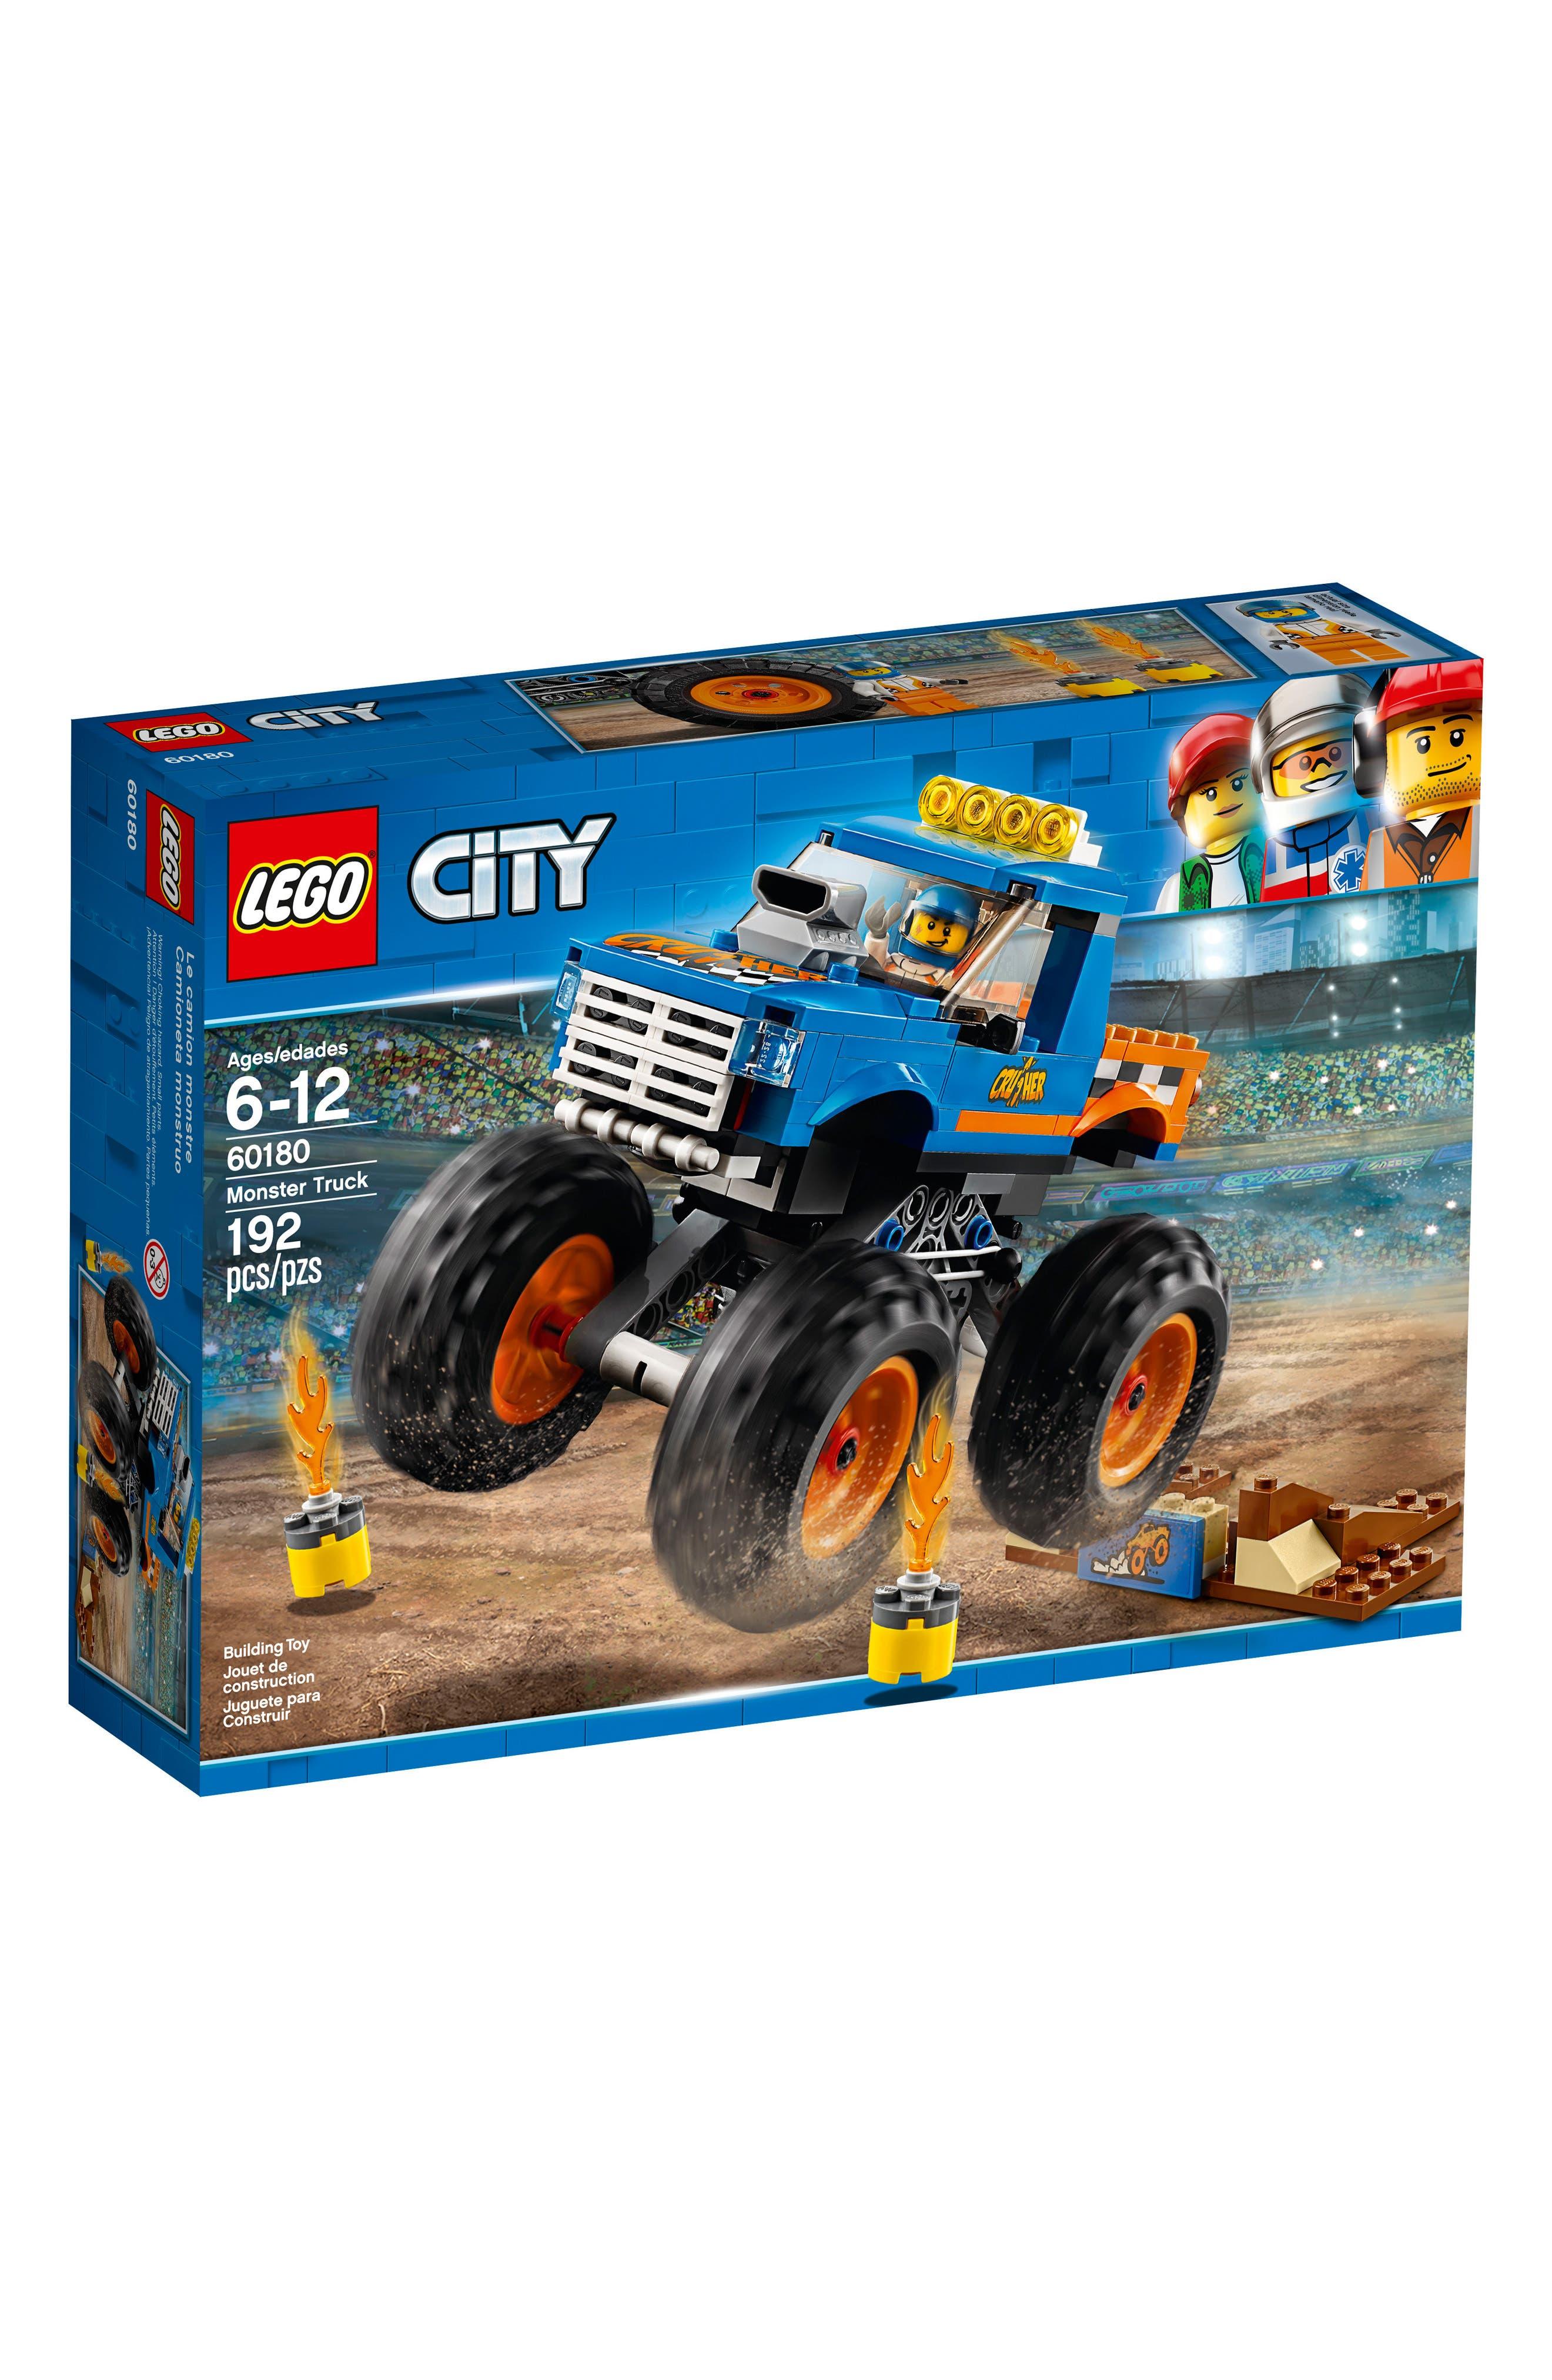 Main Image - LEGO® City Monster Truck - 60180